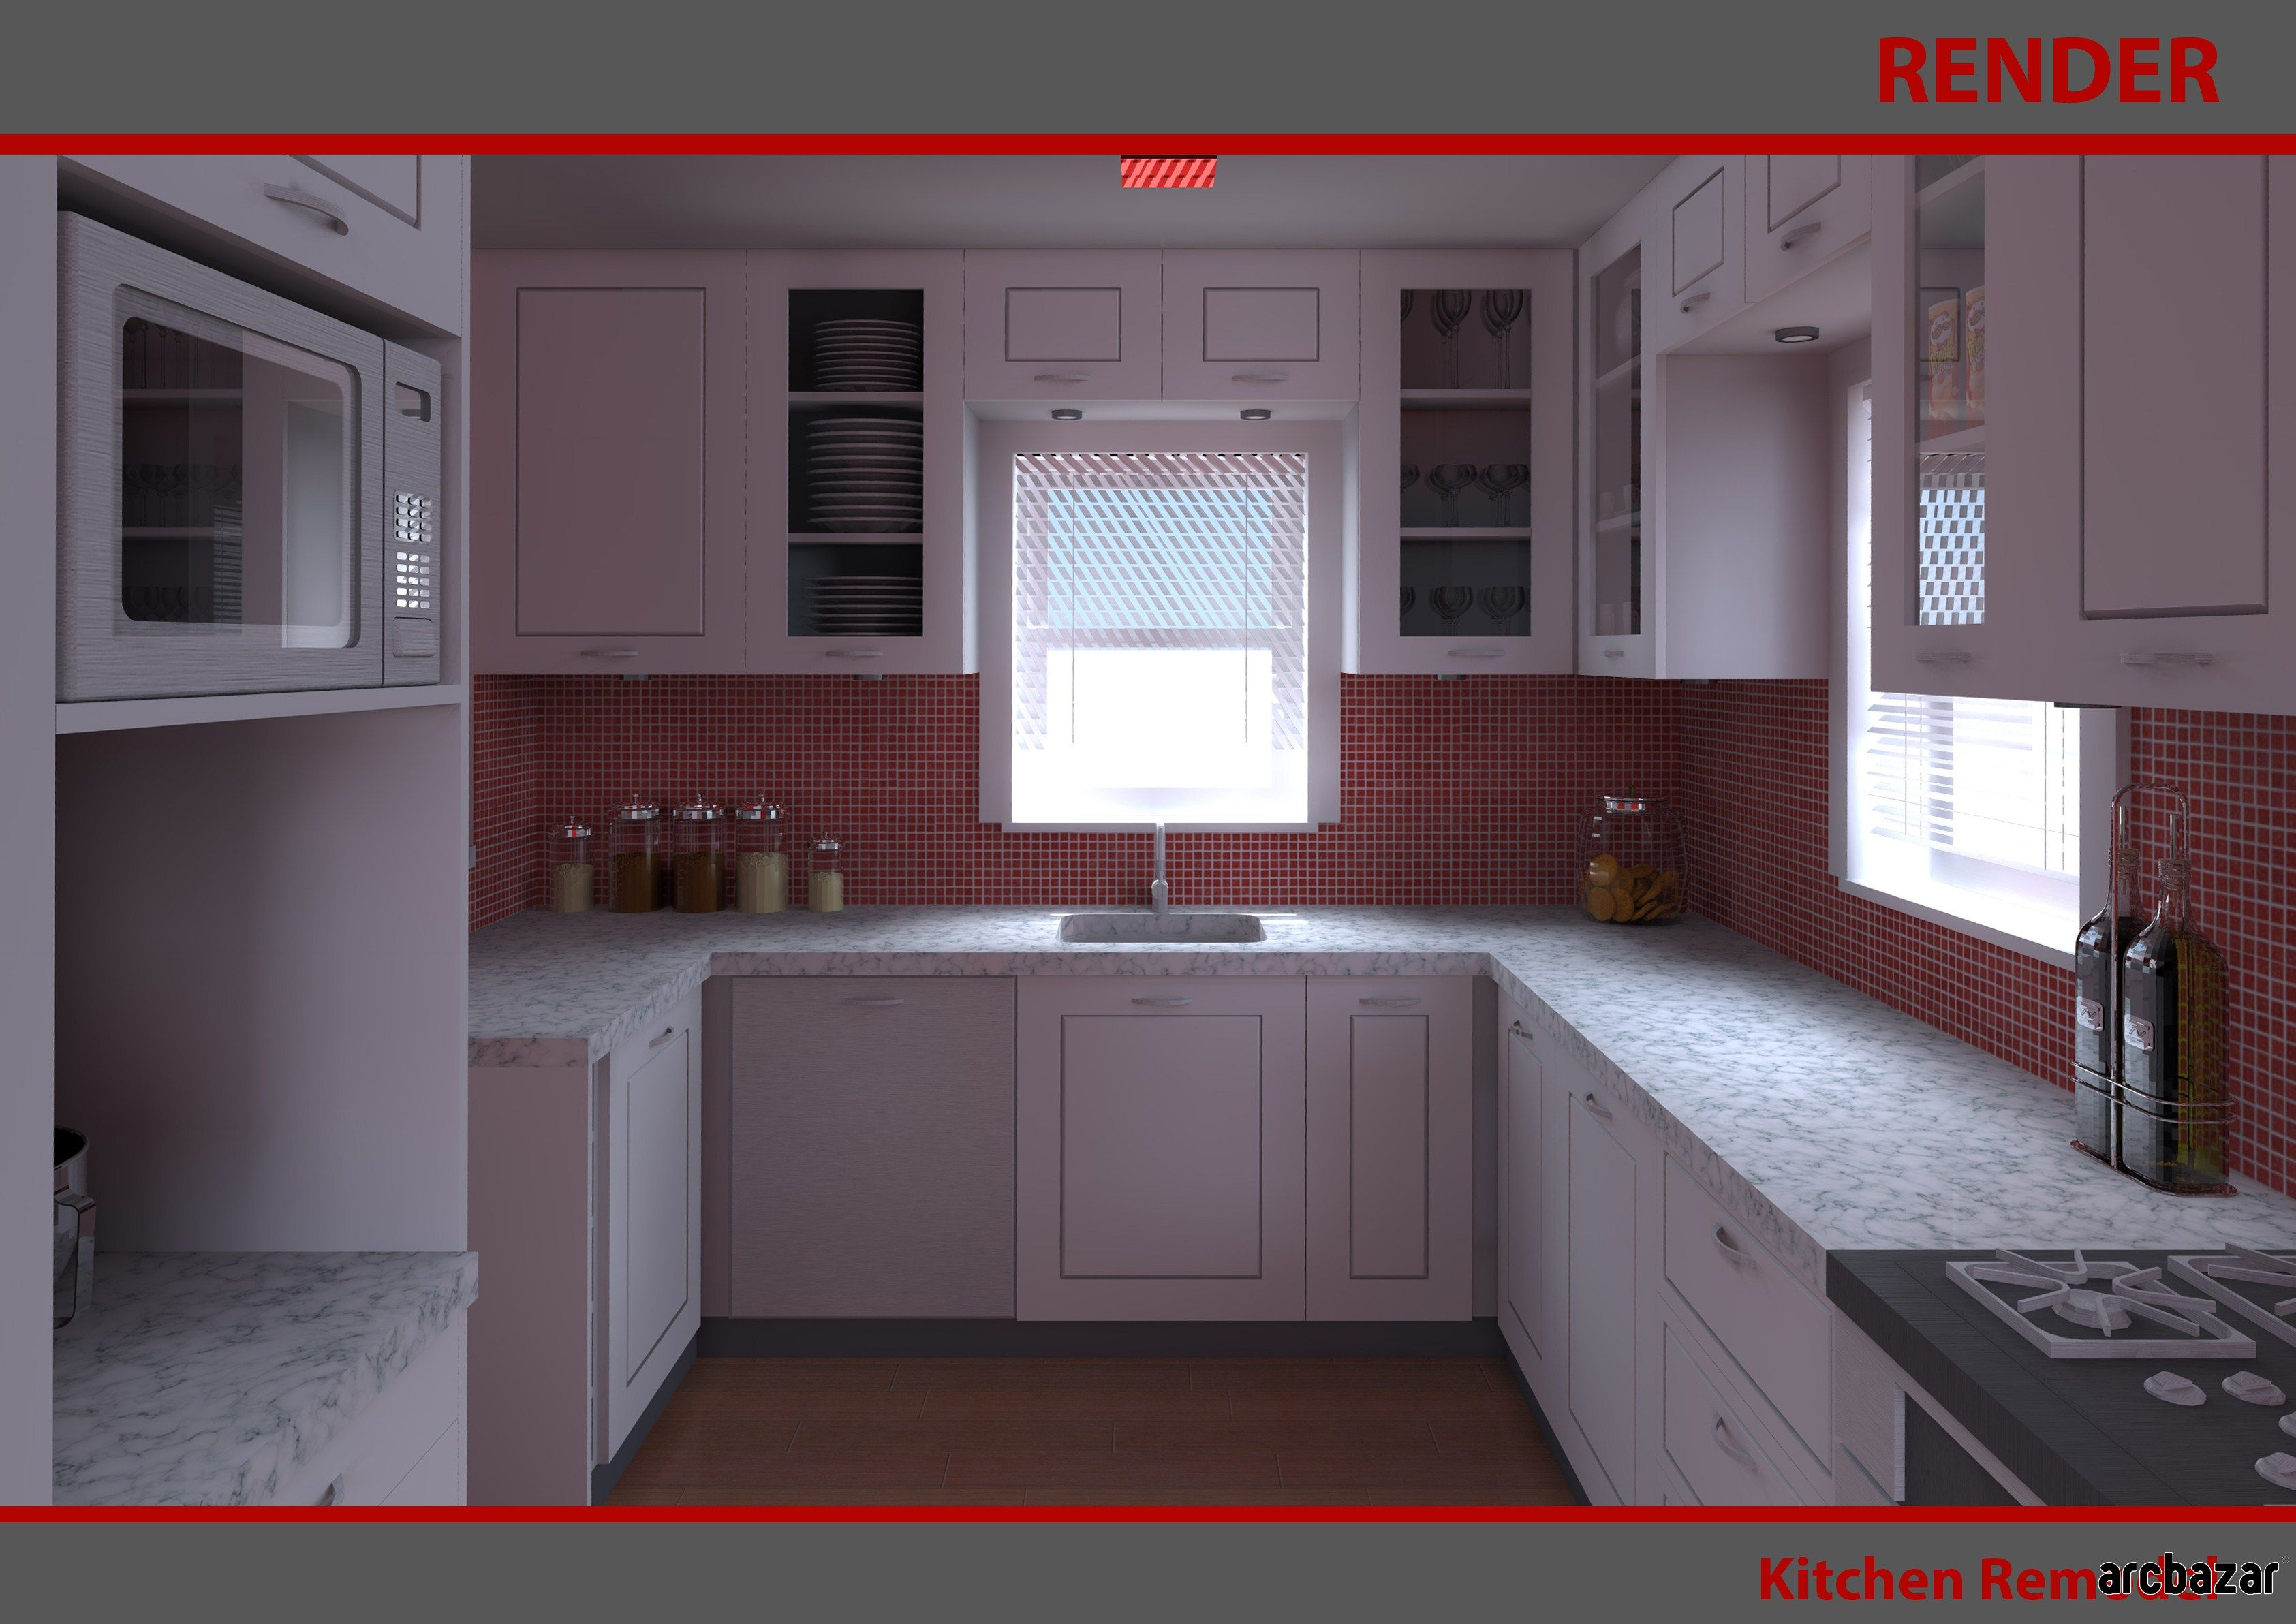 Kitchen Design Project Designed By MG Architect Studio   Kitchen Remodel   Kansas  City, Missouri, United States